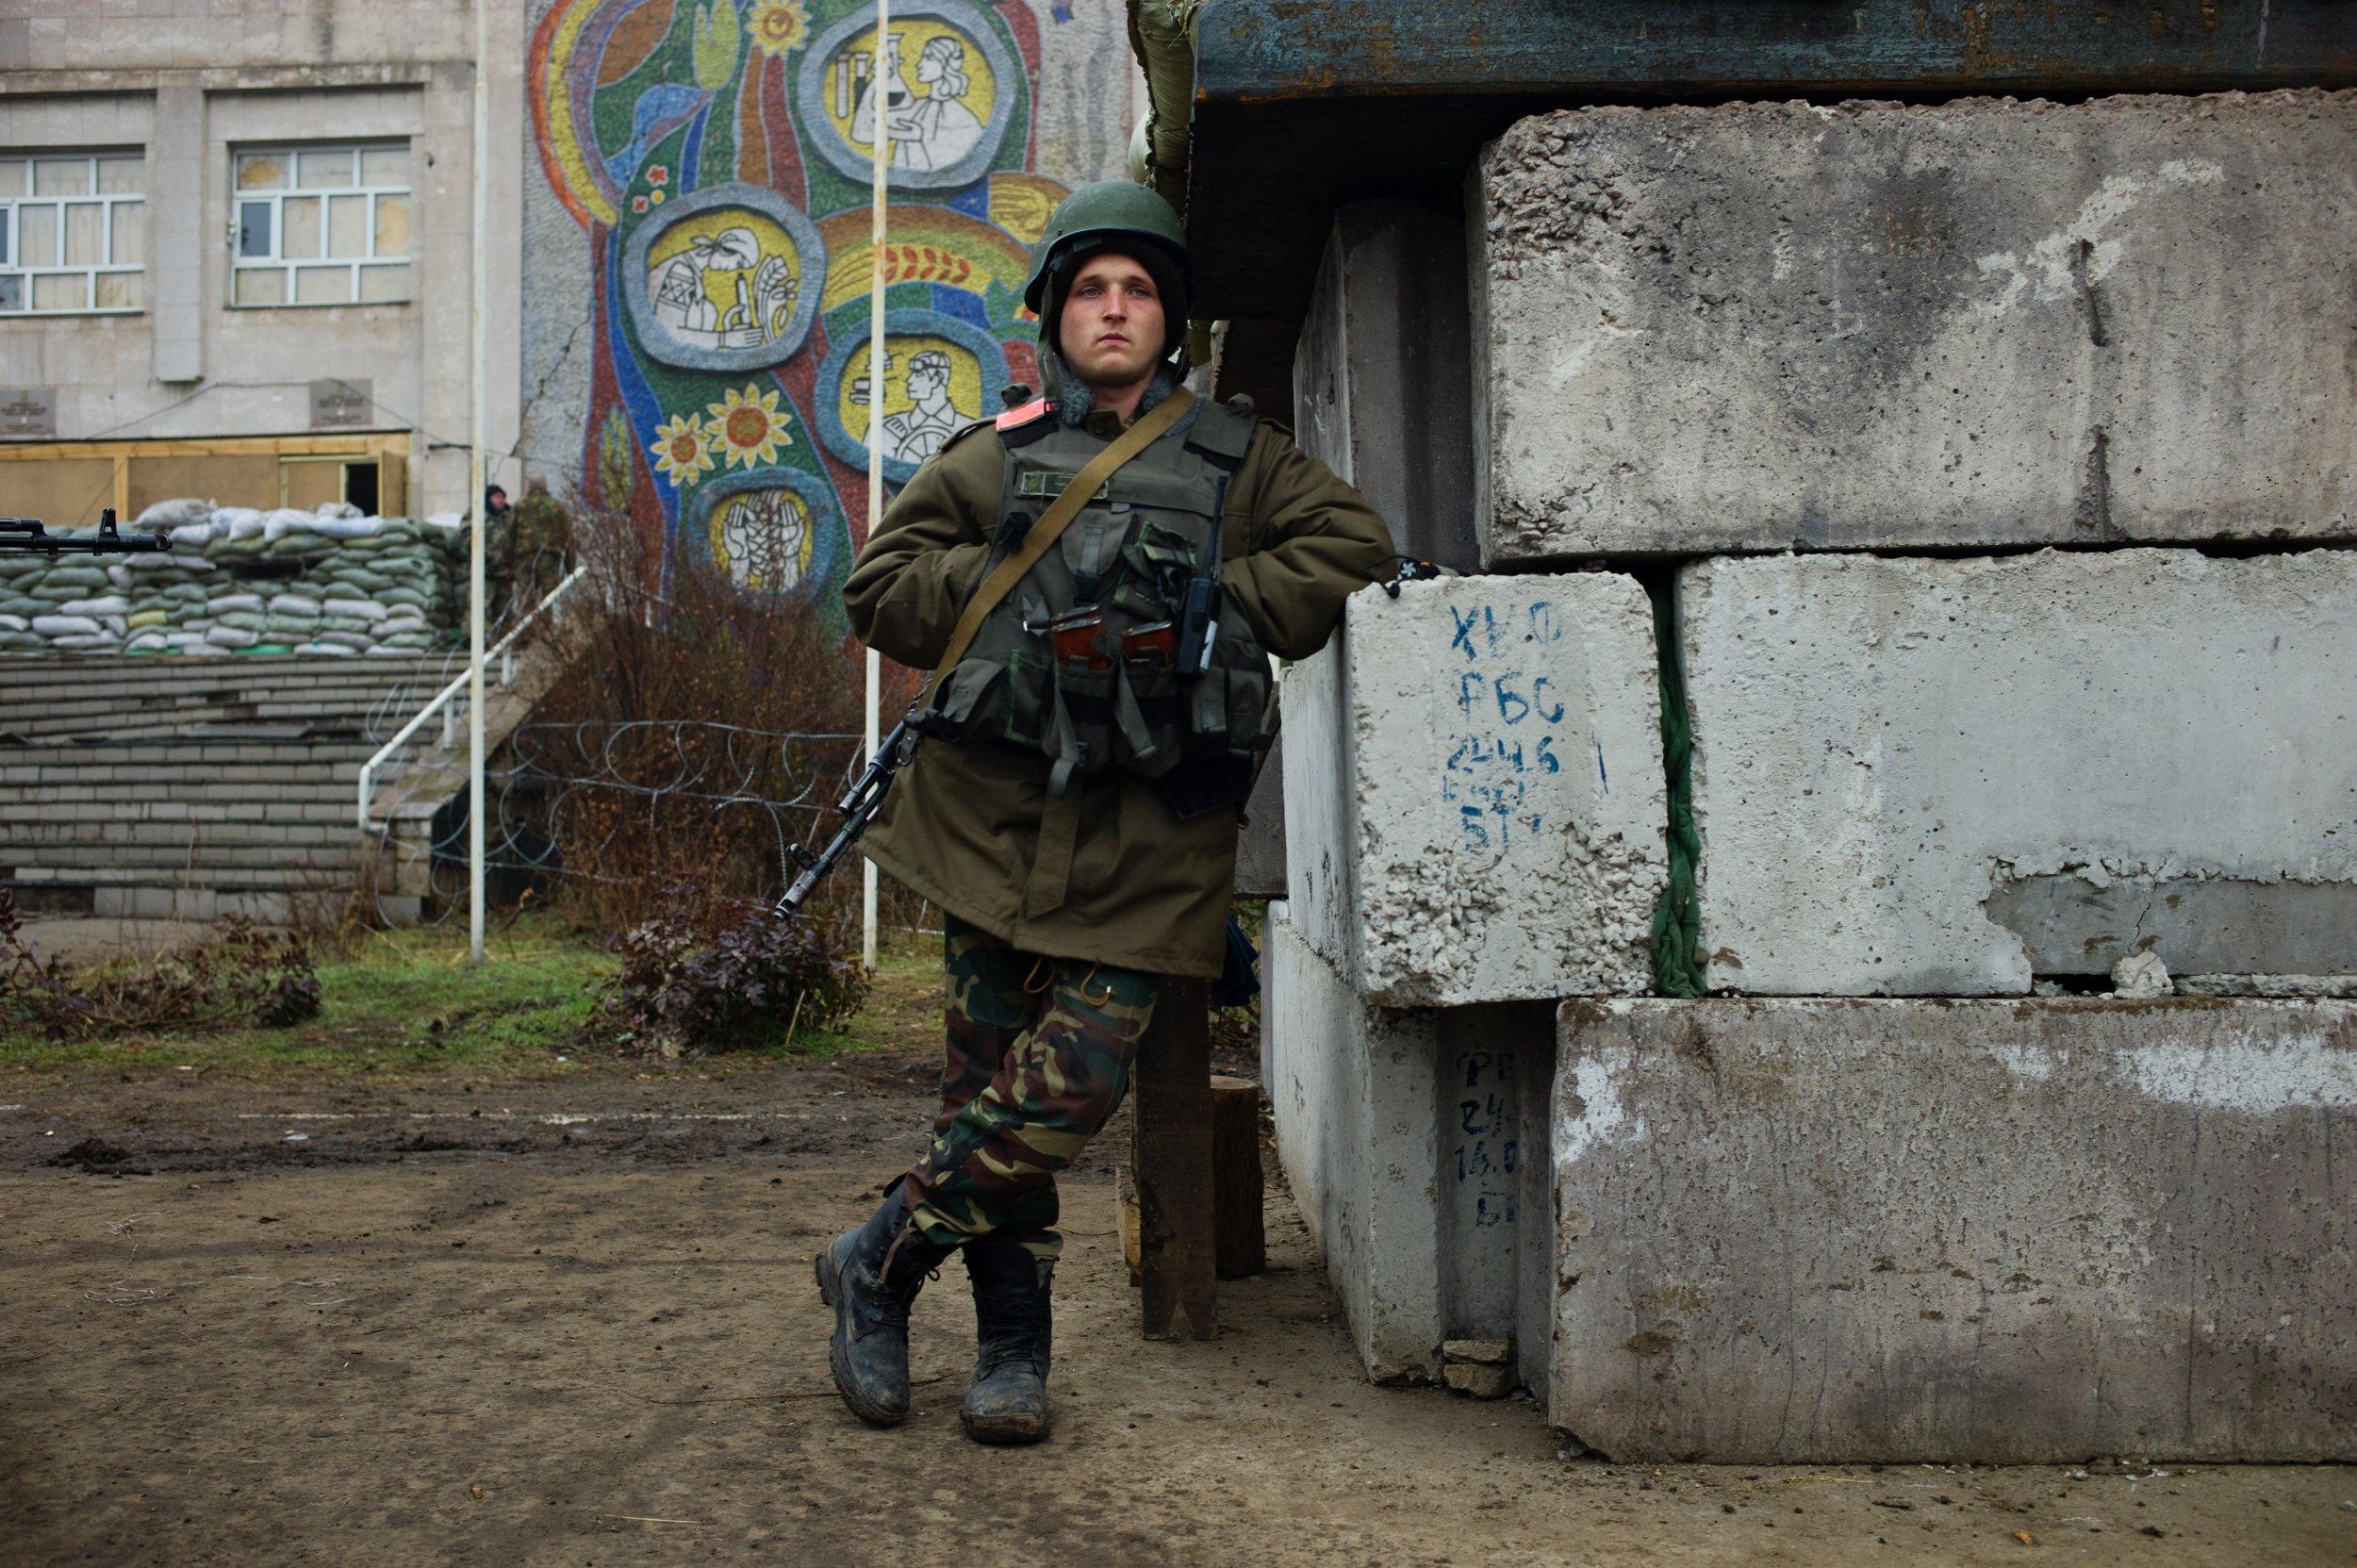 01_09_Ukraine_01